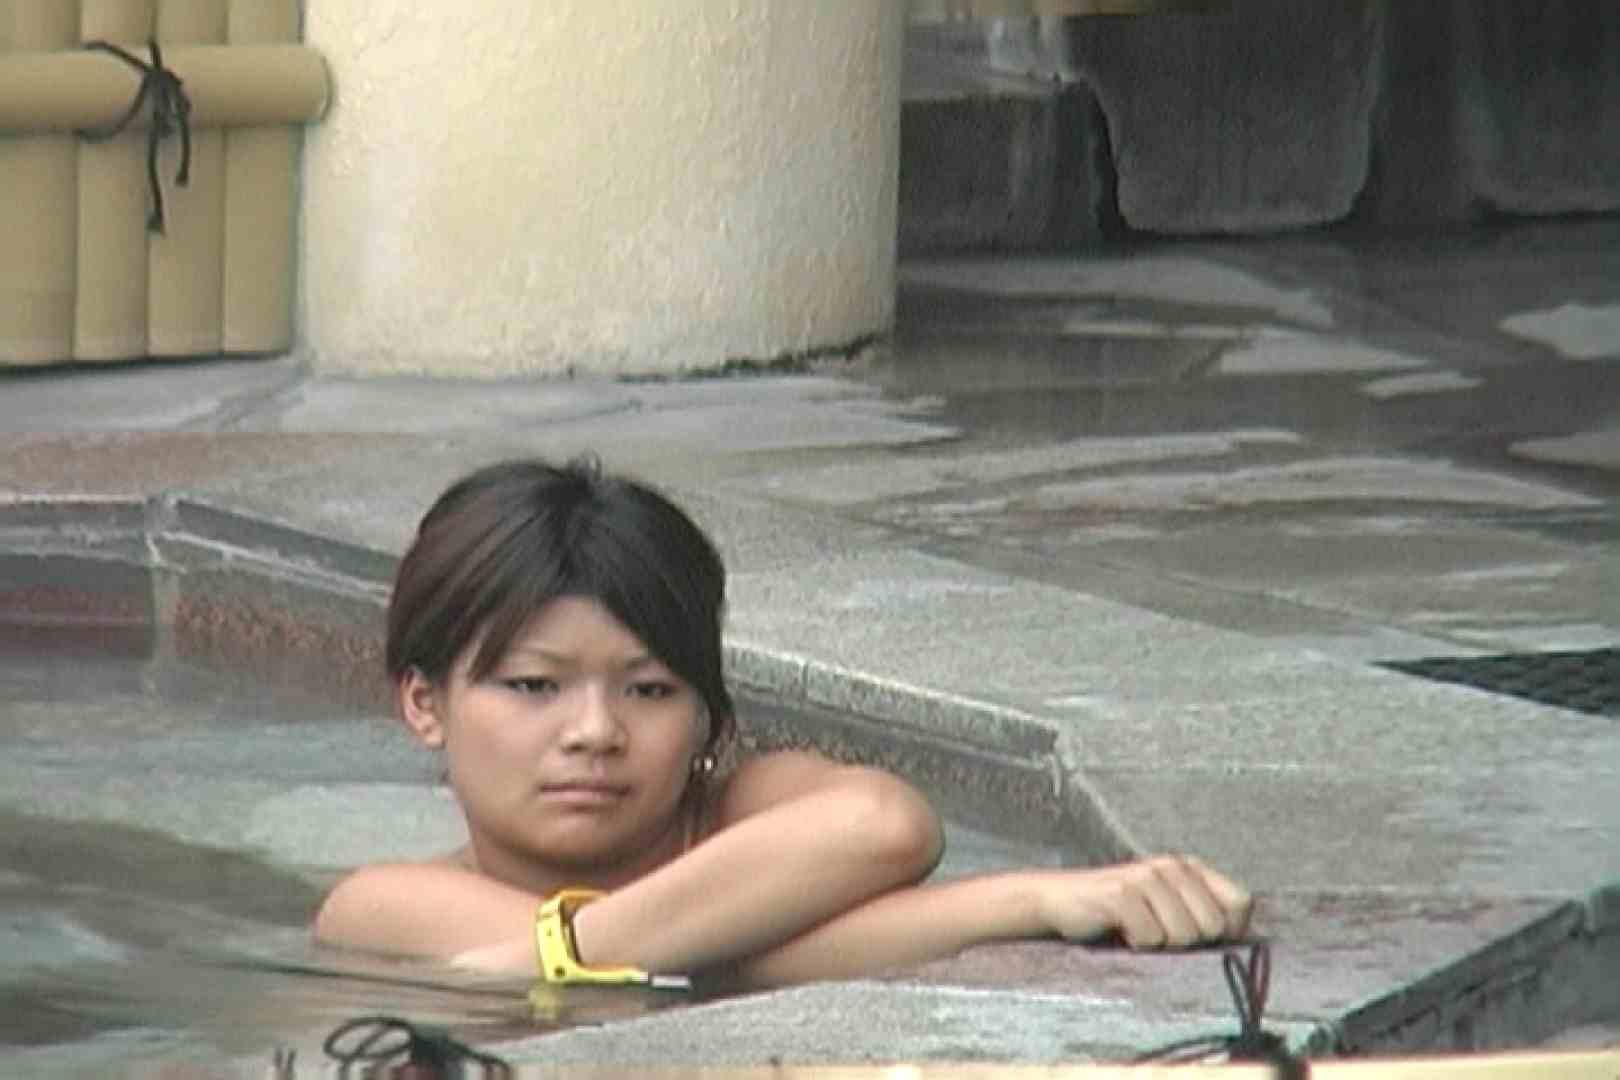 Aquaな露天風呂Vol.544 盗撮シリーズ   露天風呂編  80PIX 57